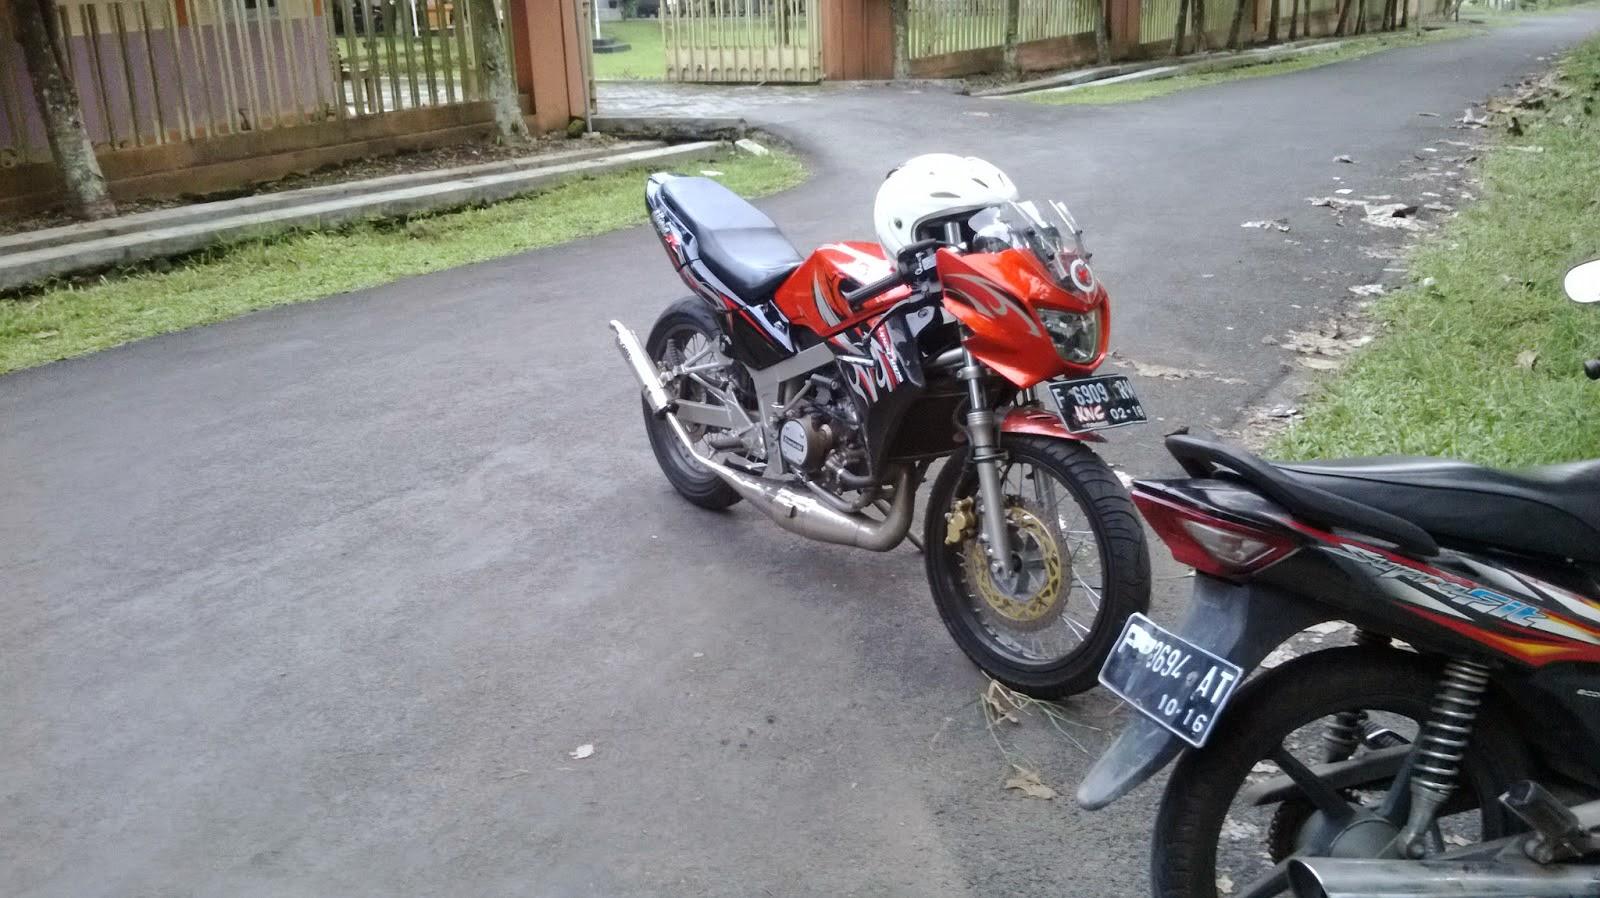 Street Motorcycle: July 2014